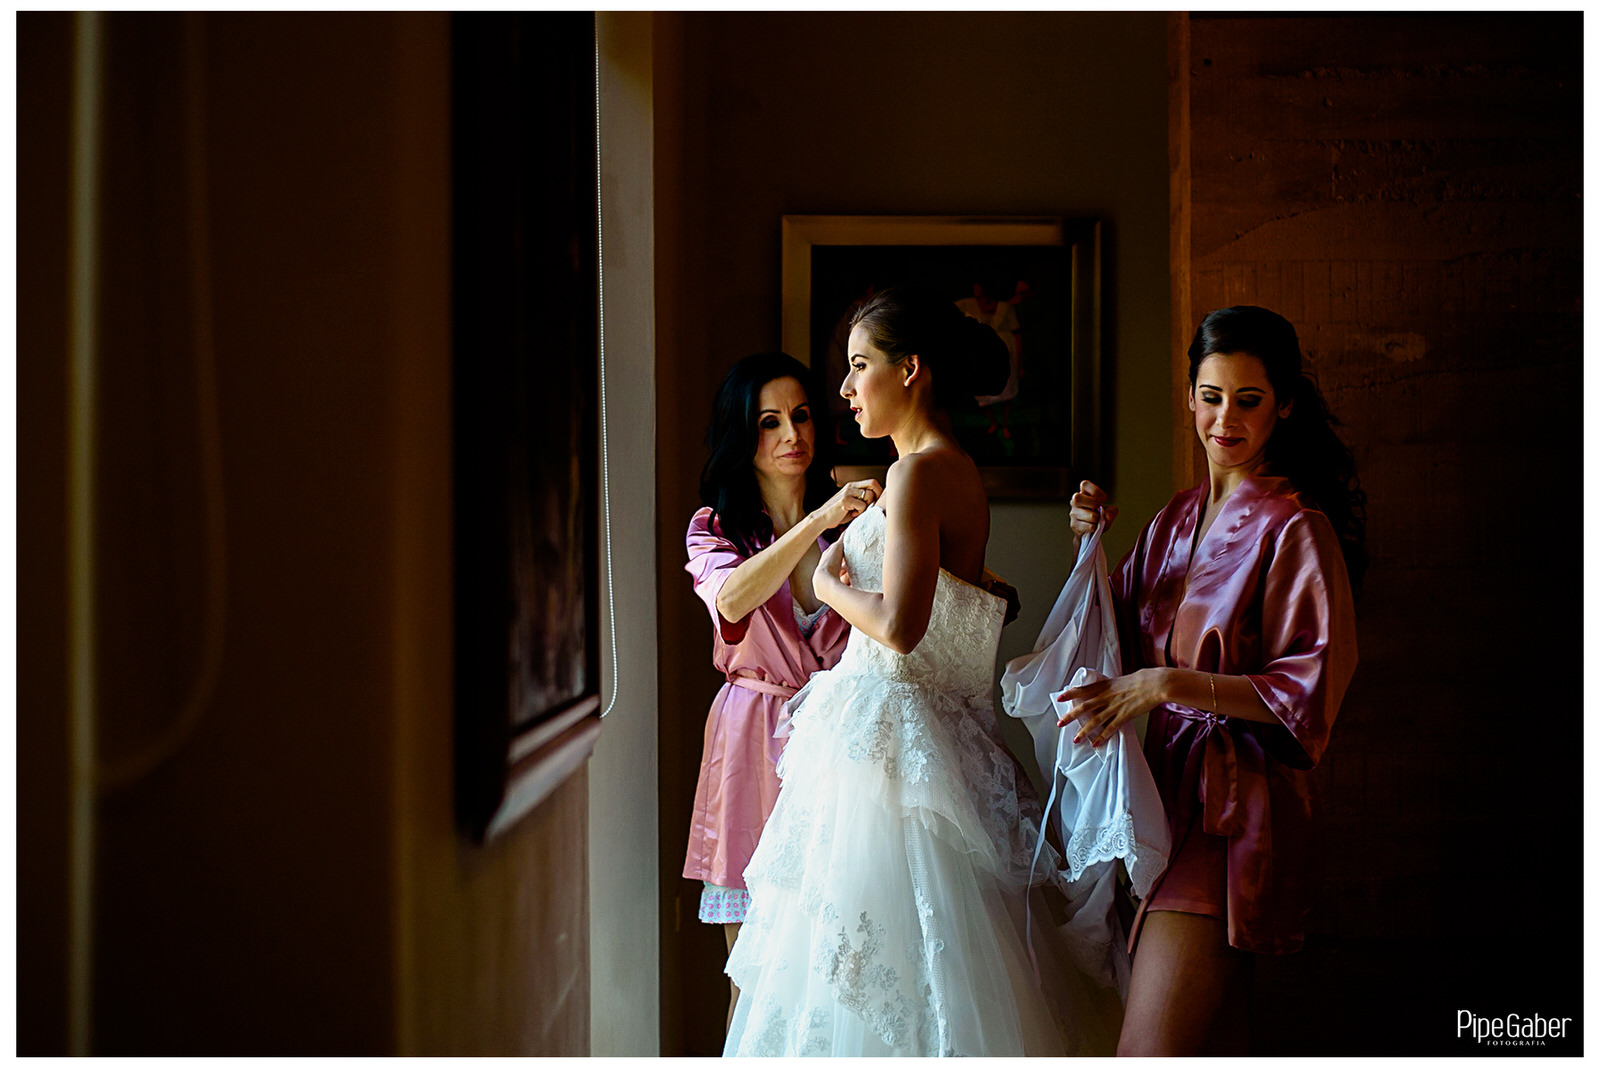 Boda_destino_yucatan_monterrey_fotograf_wedding_photographer_004.JPG